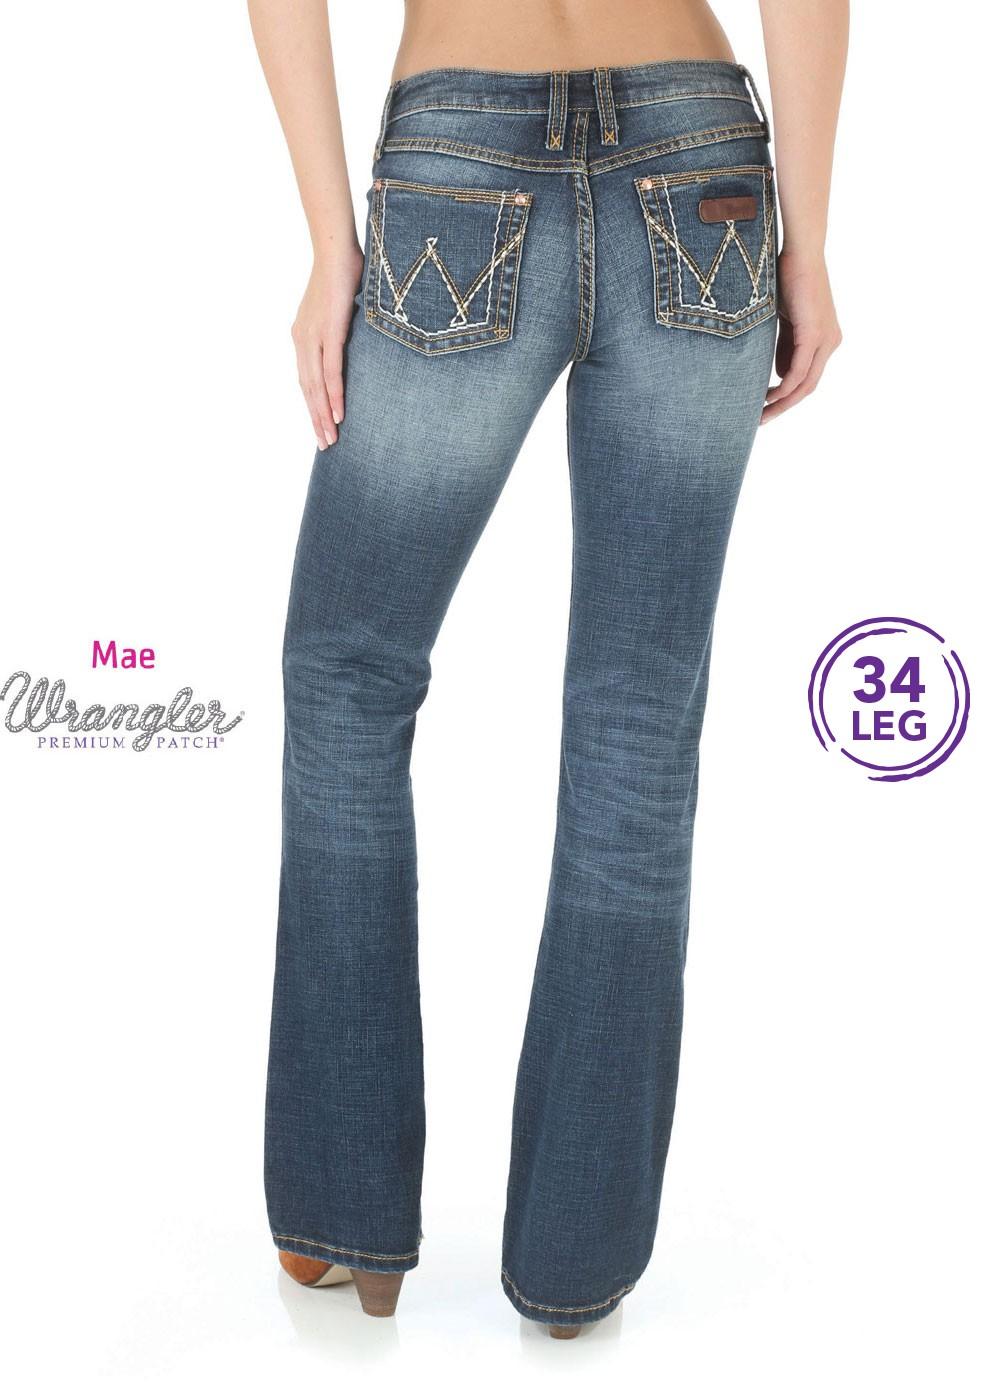 Wrangler Womens Premium Patch Mae Jean